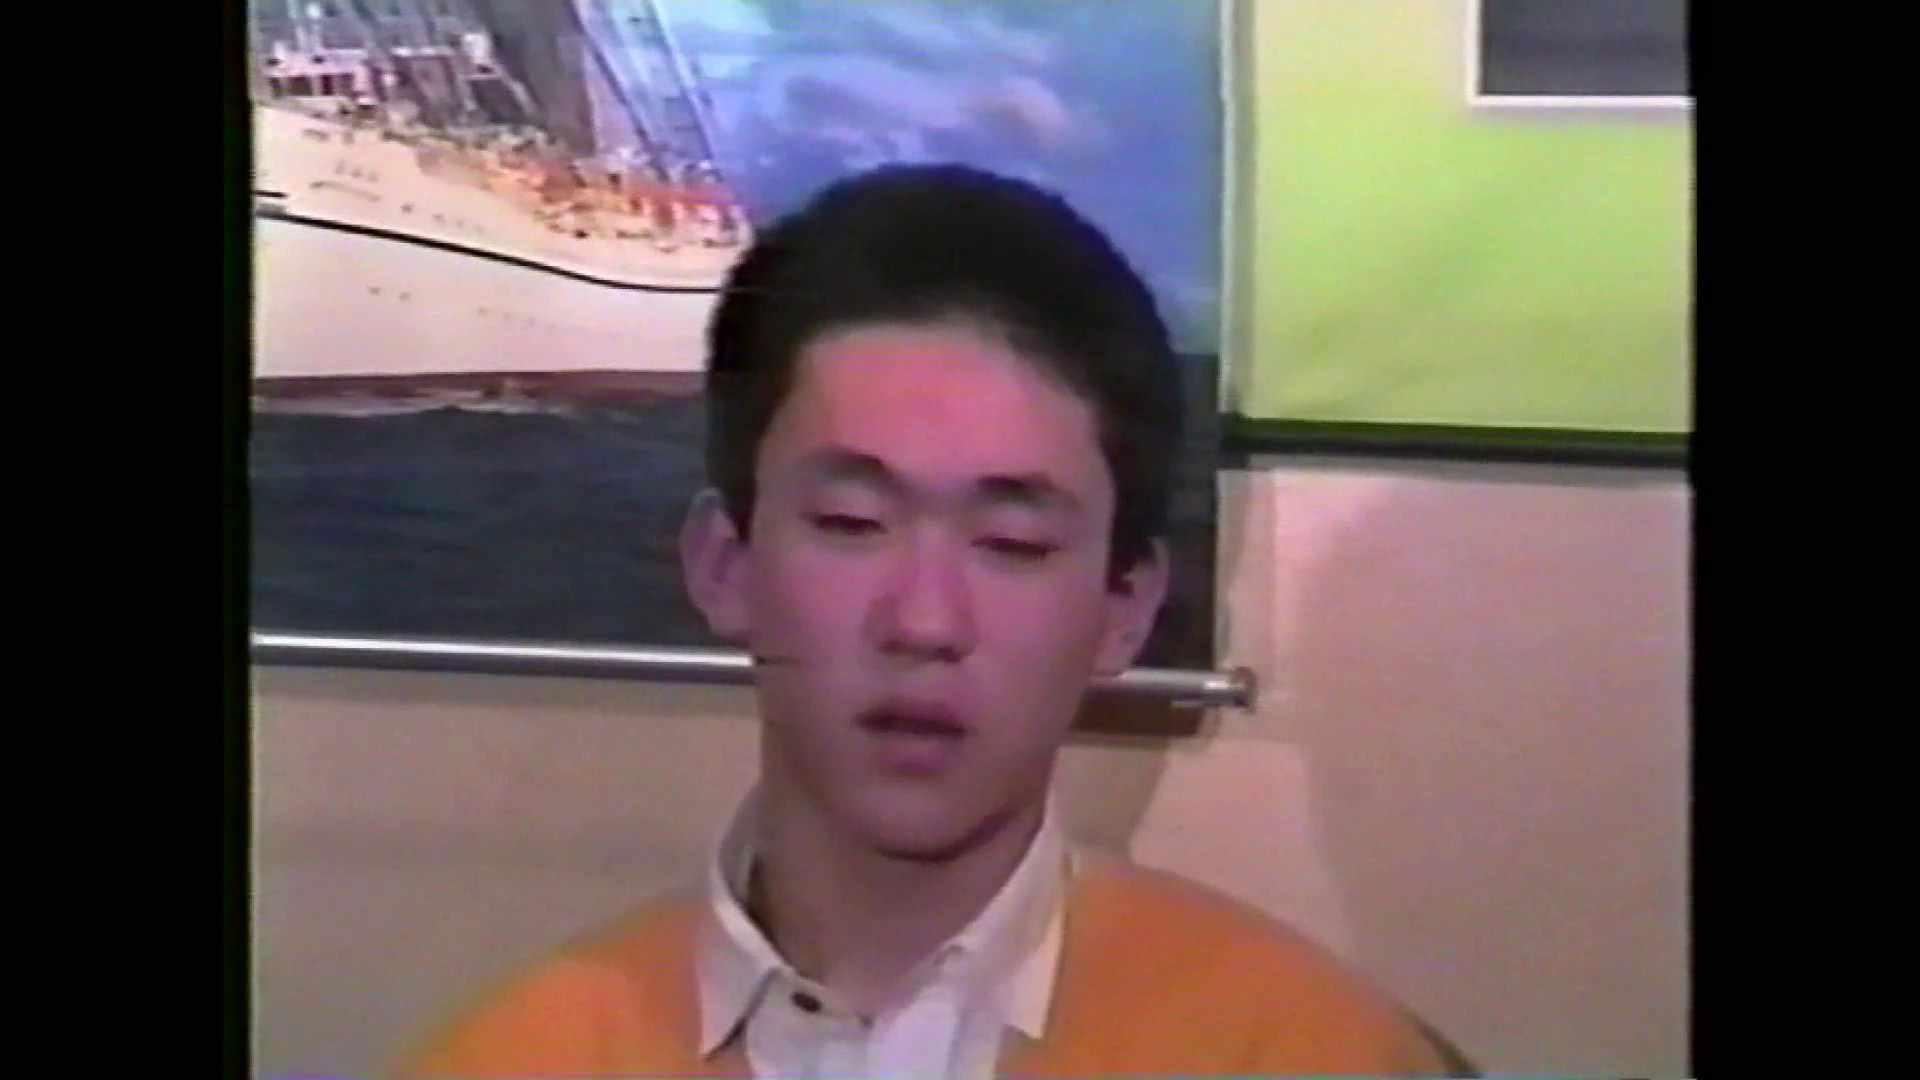 GAYBOY宏のオカズ倉庫Vol.2-1 ゲイのペニス ペニス画像 68枚 2